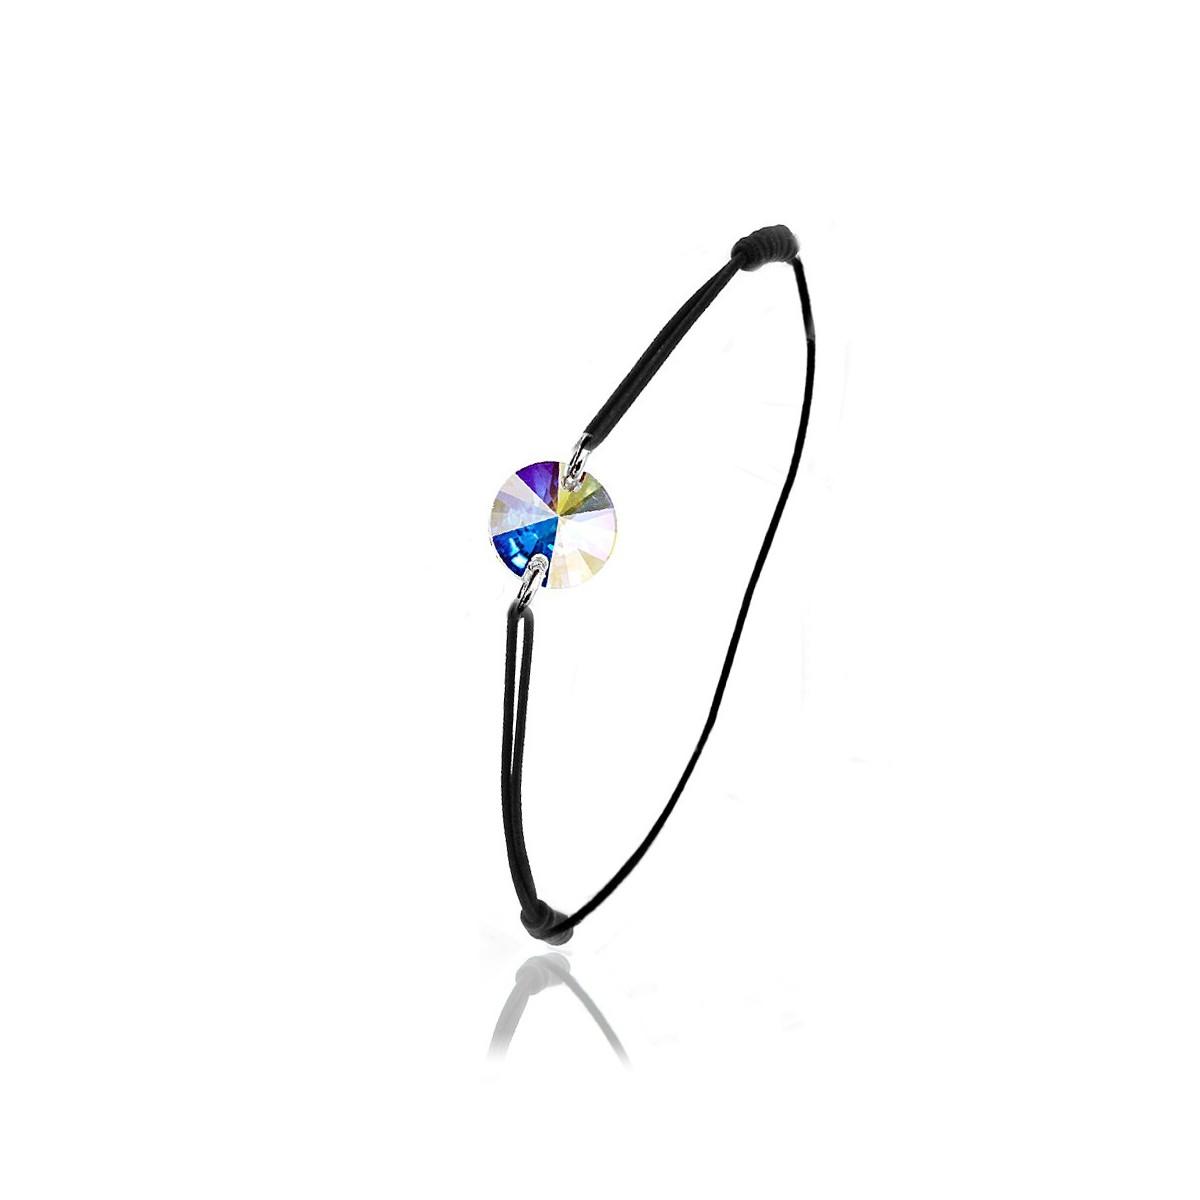 BS014-SB049-IRIS Bracelet élastique So Charm orné d'un cristal irisé made with crystal from Swarovski